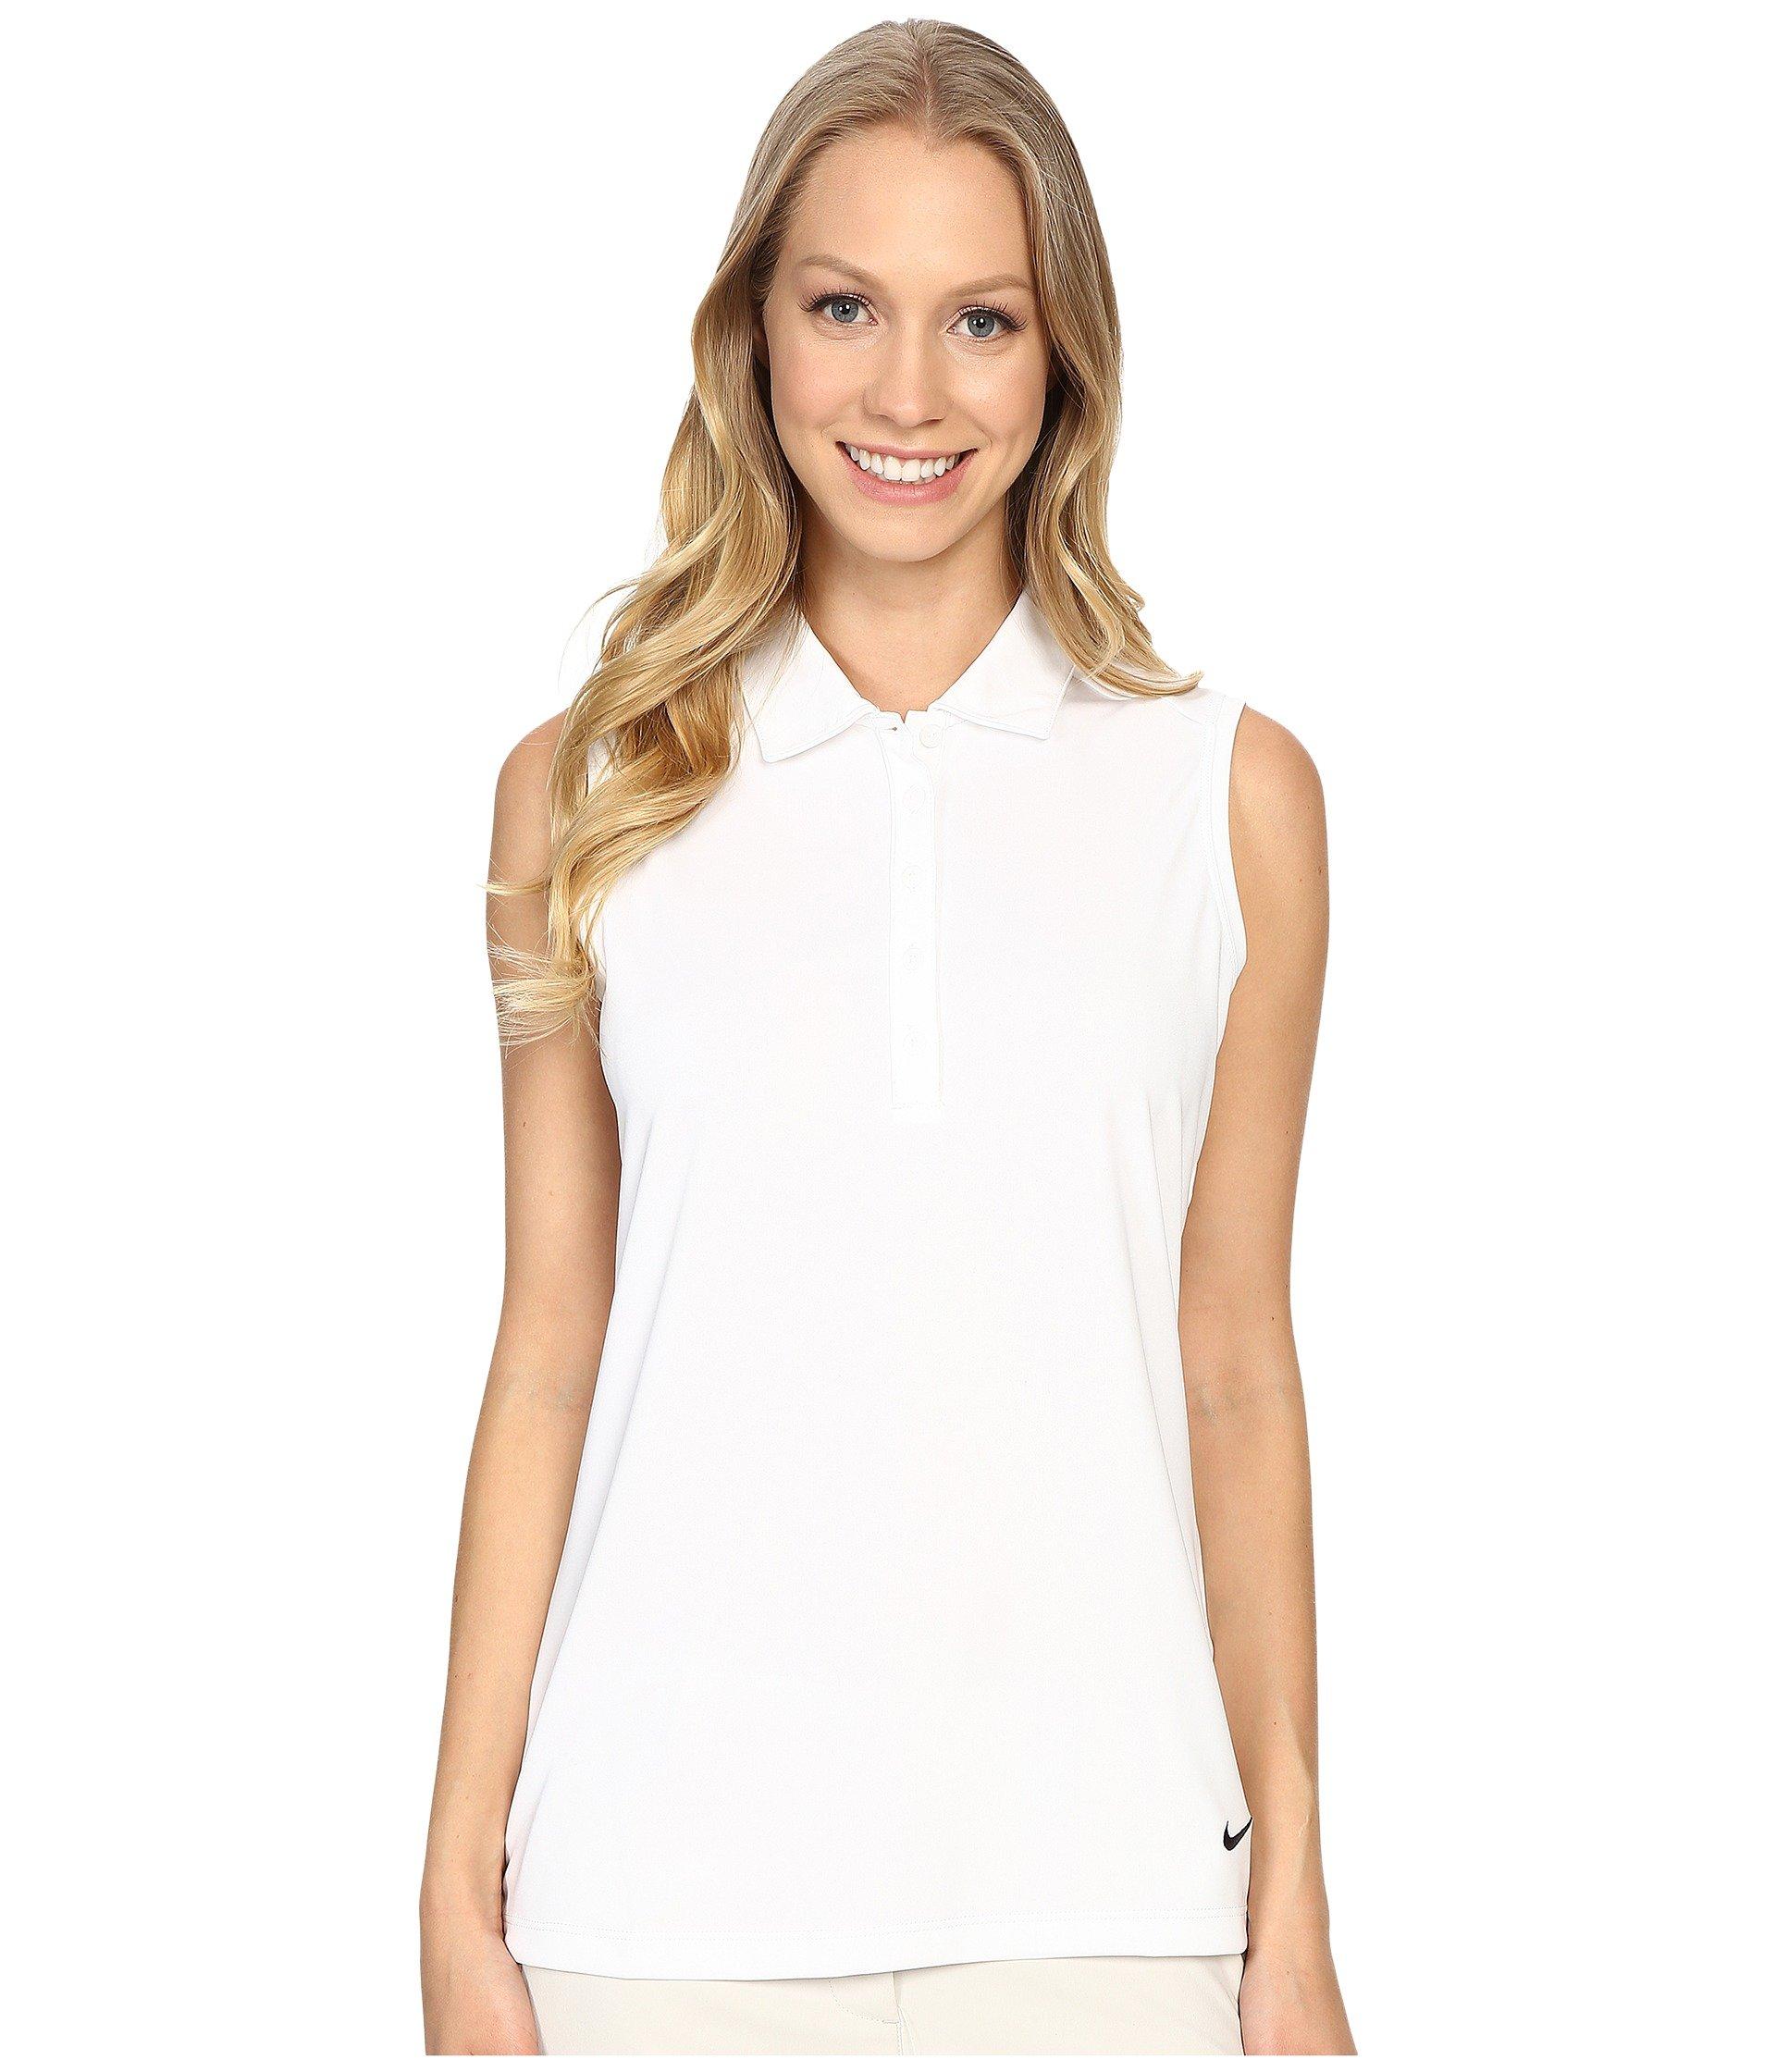 Nike Women's Victory Solid Sleeveless Polo, White/Black XS